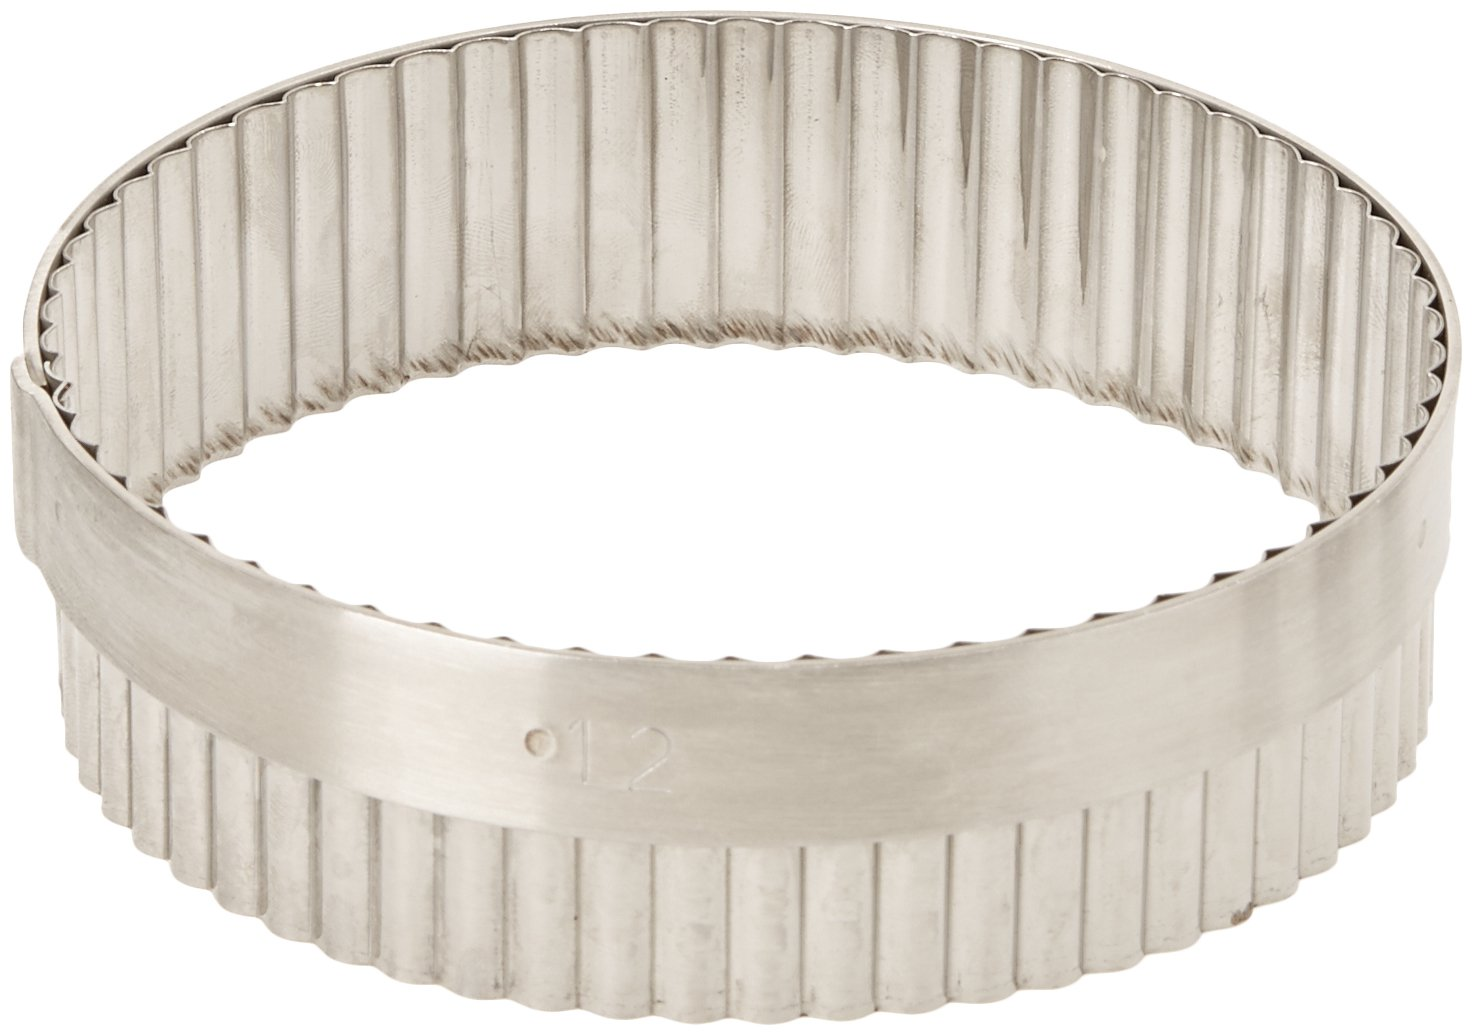 De Buyer 3314.06 Elastomoule Round Fluted Cutter, 6 cm Diameter 331406